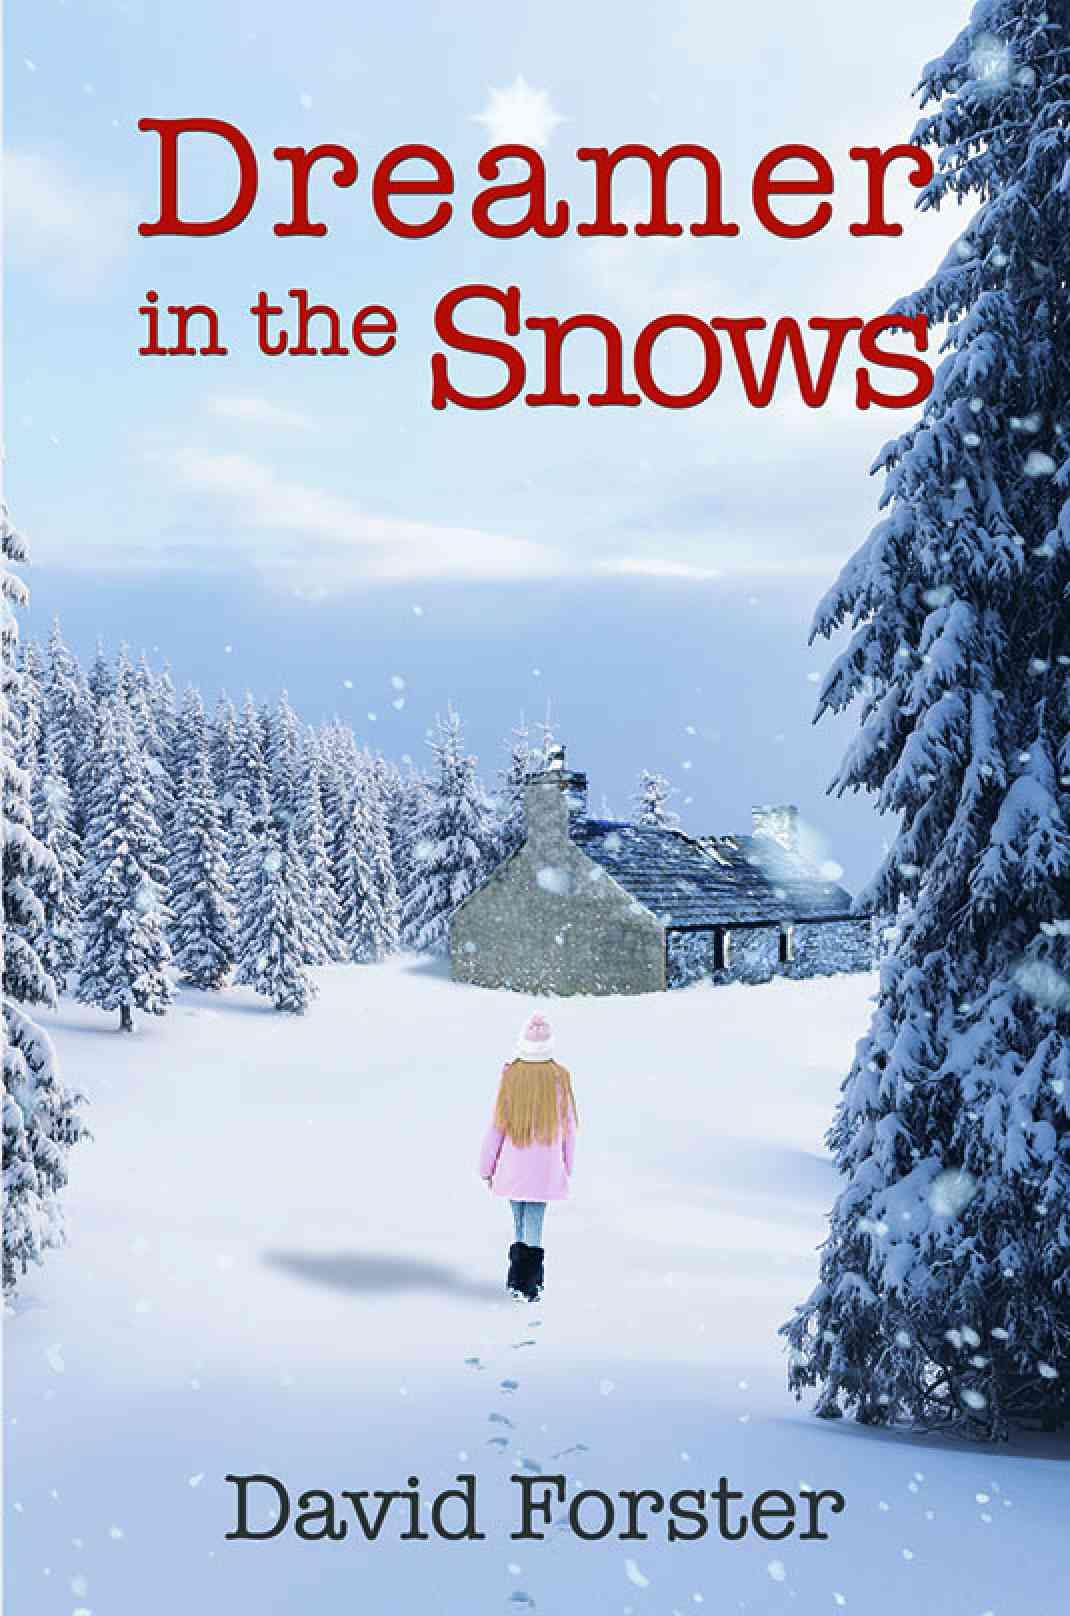 Dreamer in the Snows